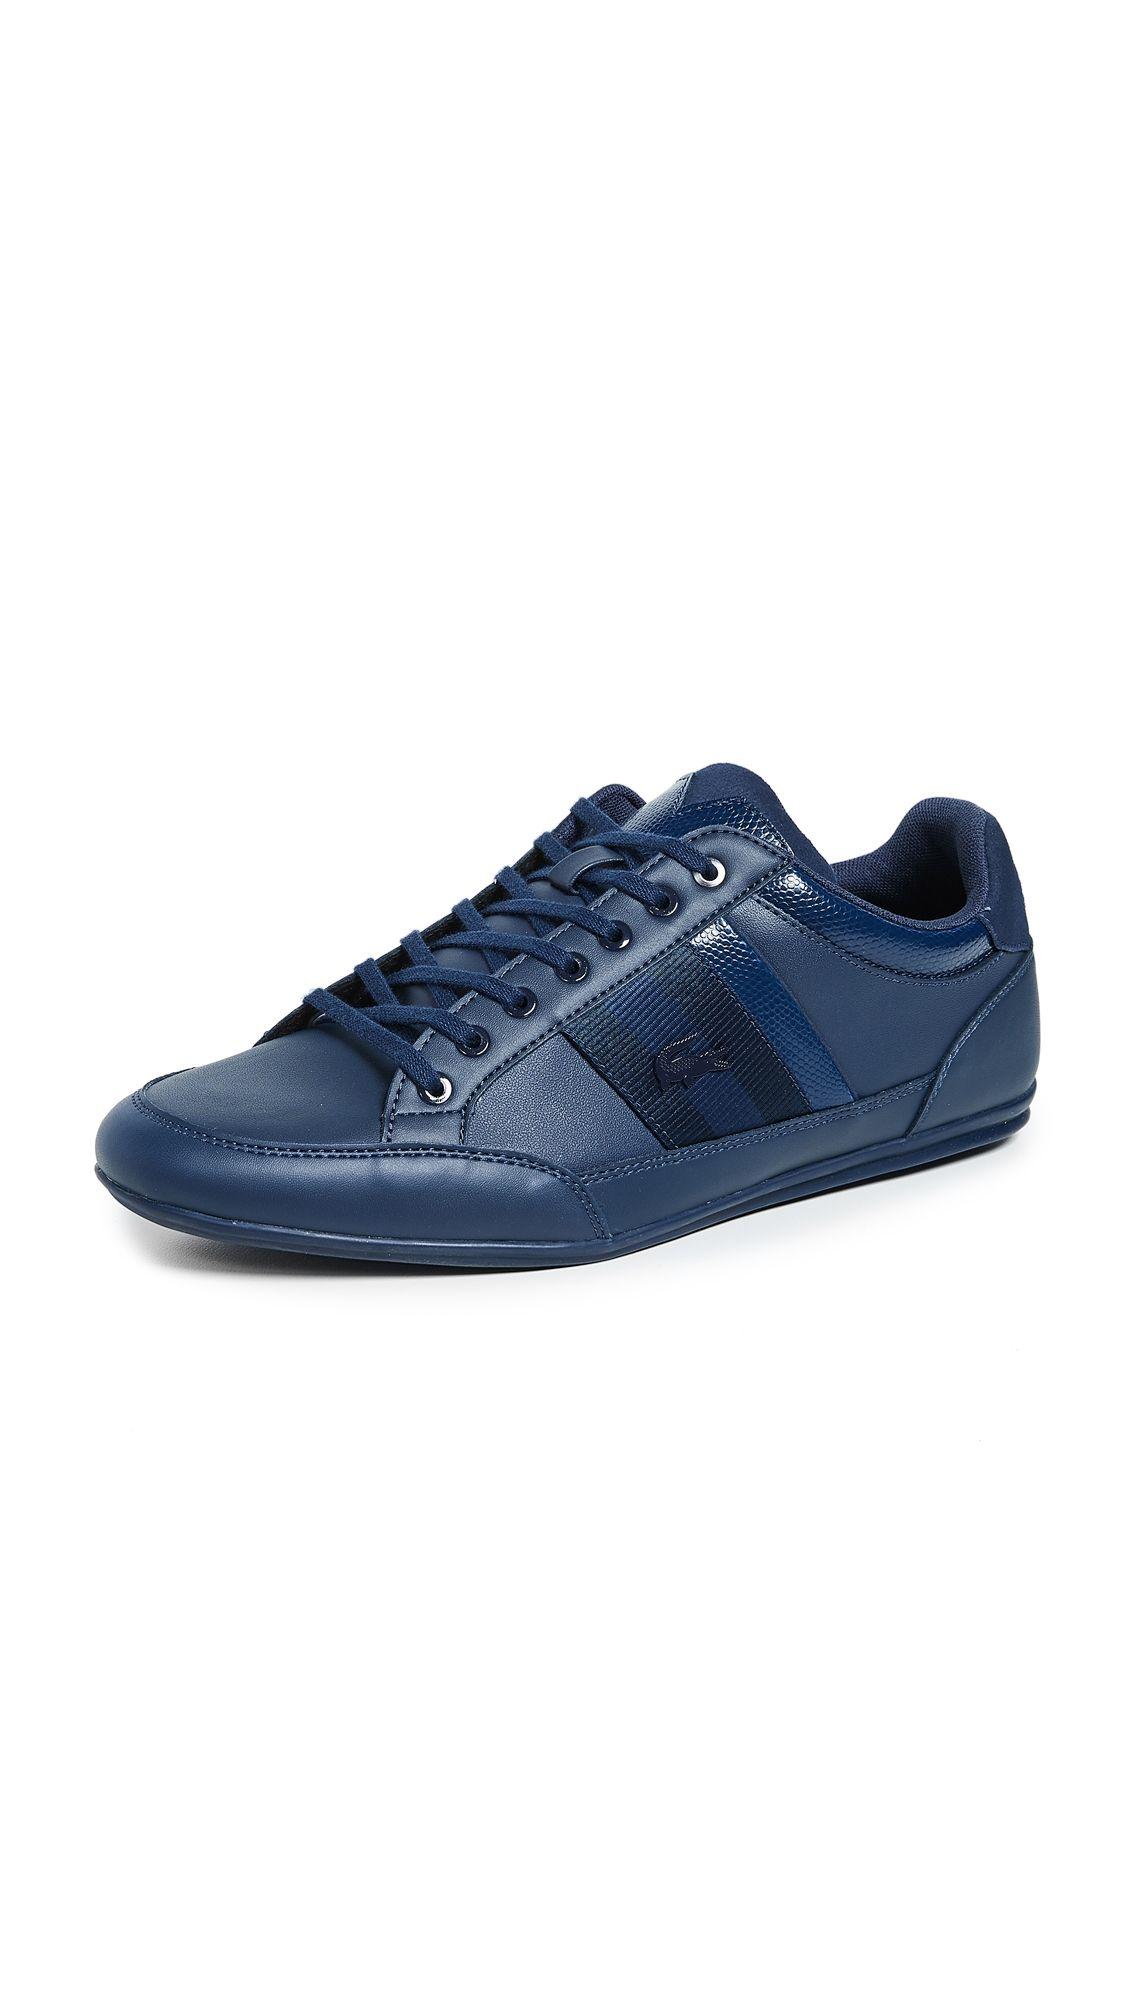 c59e6b84c1 LACOSTE CHAYMON LOW PROFILE SNEAKERS. #lacoste #shoes | Lacoste in ...